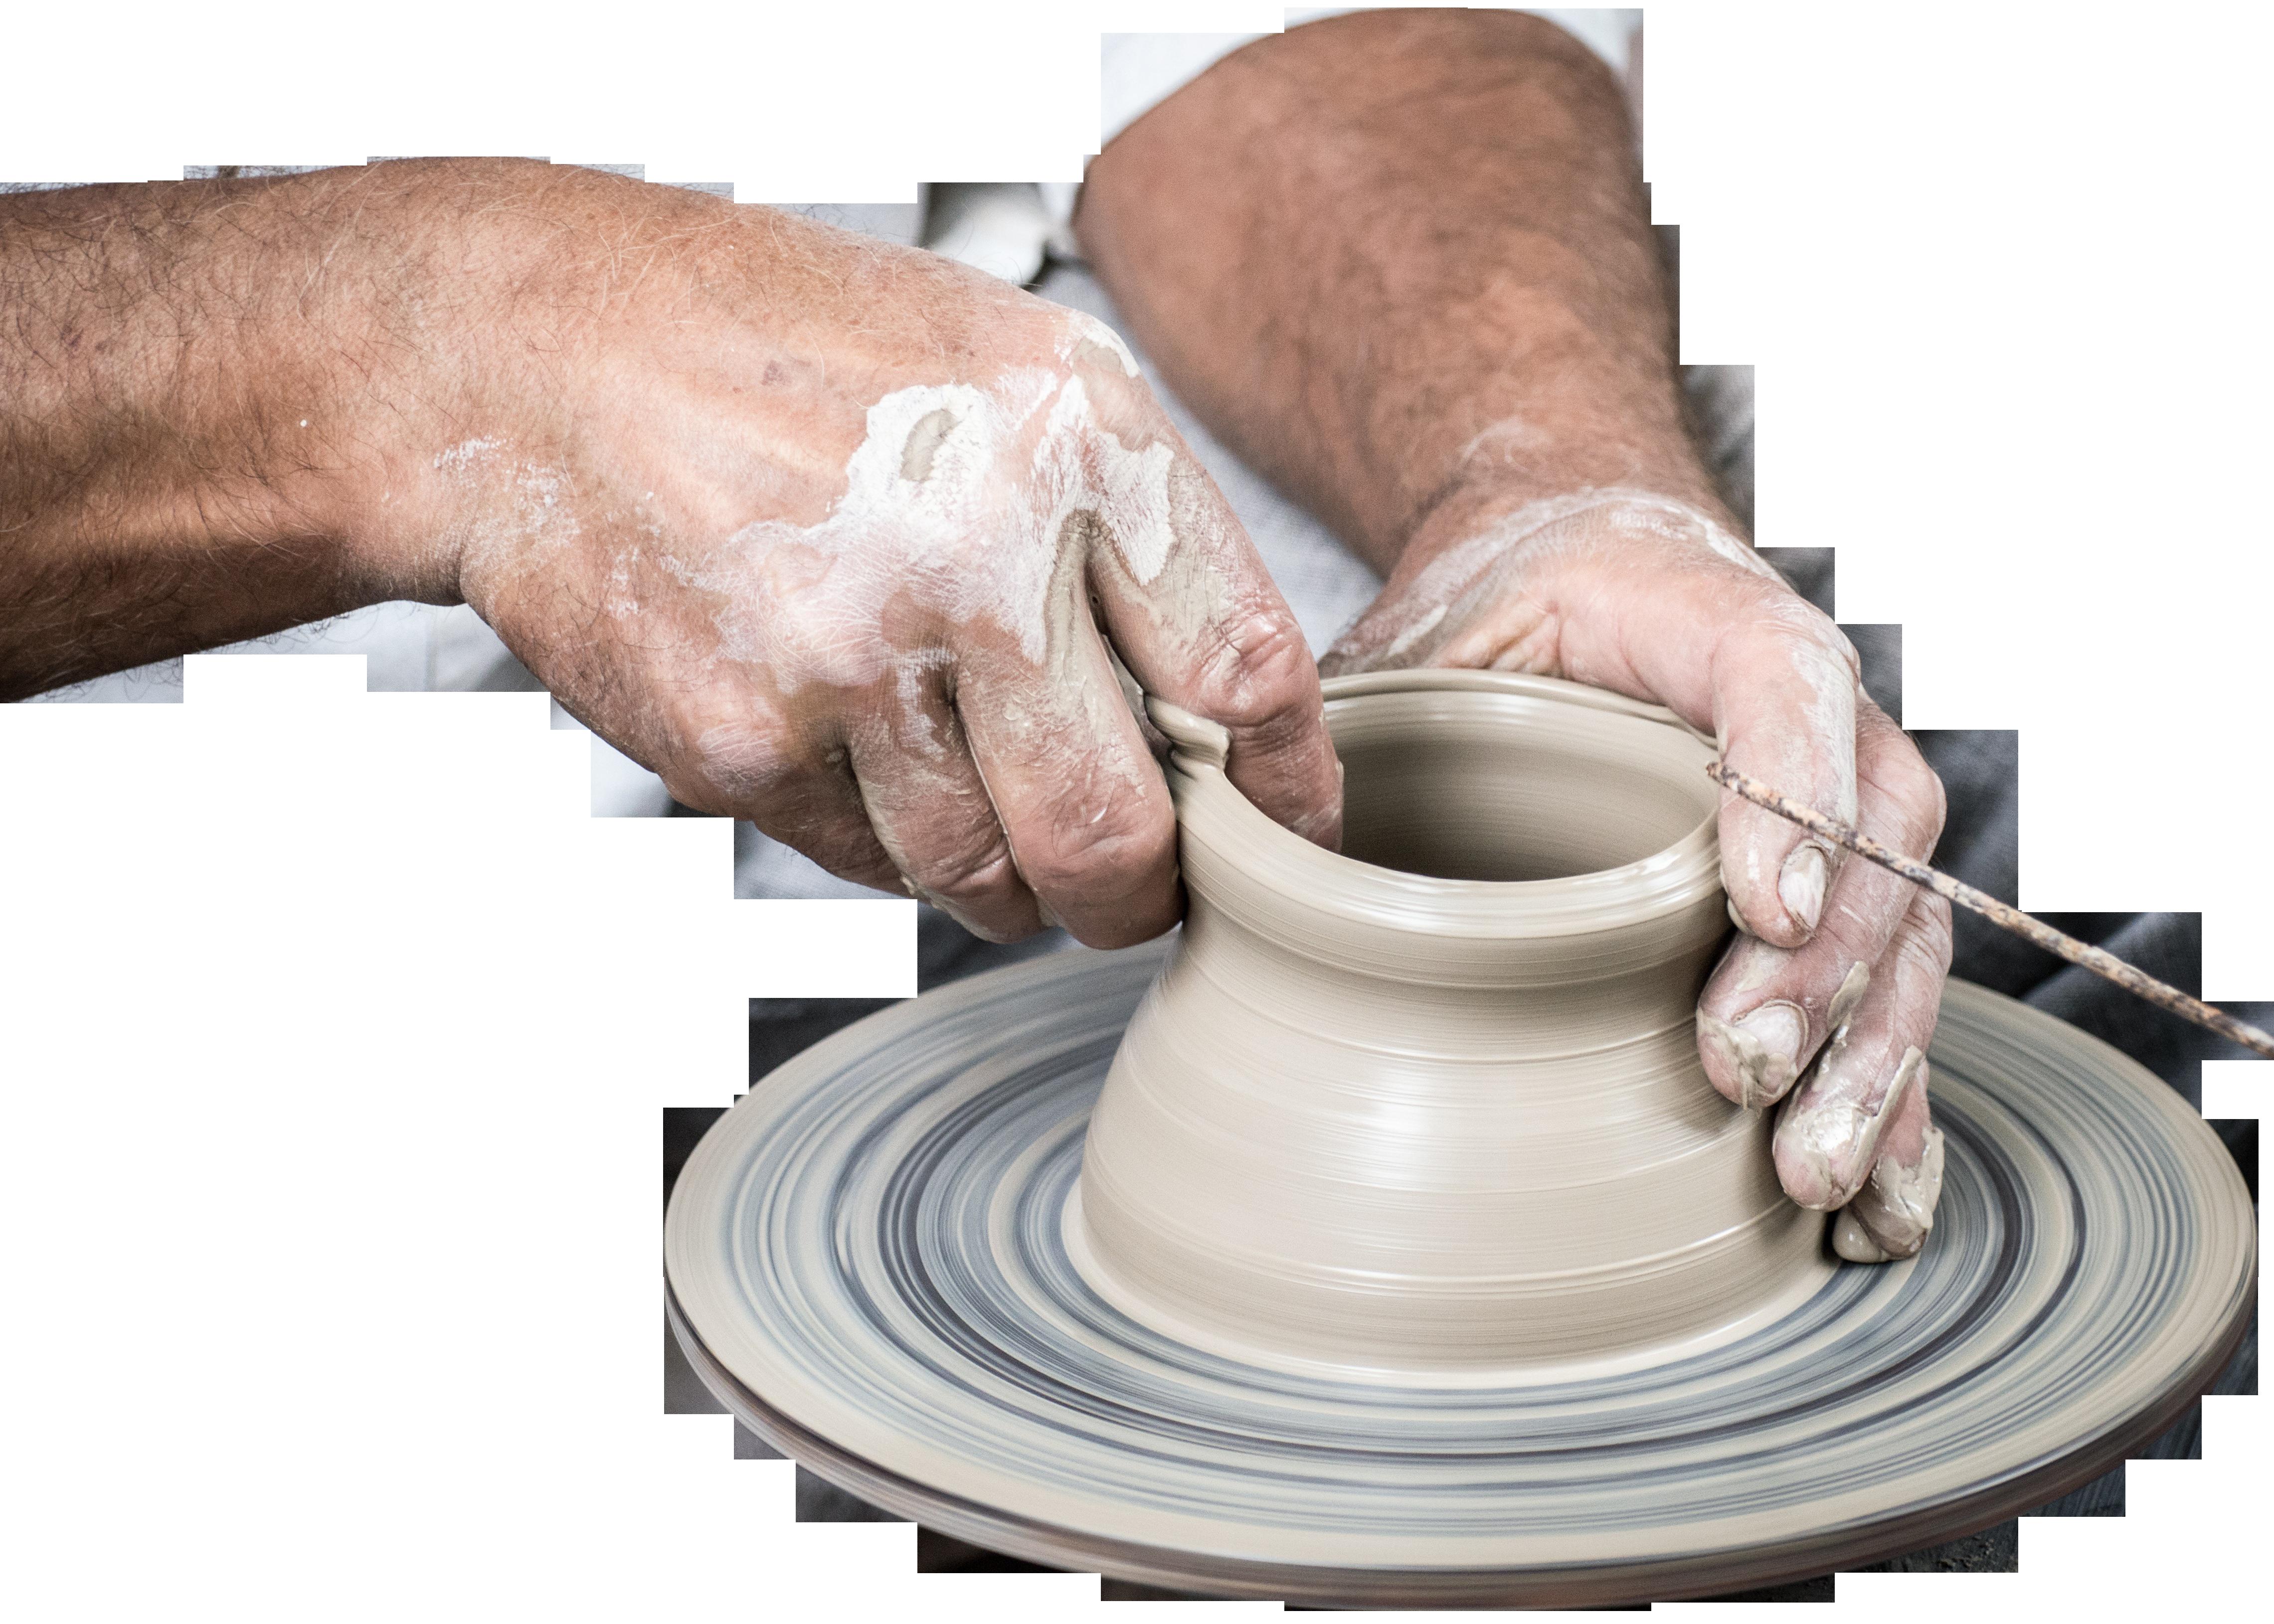 Handmade Vase Pottery PNG Image